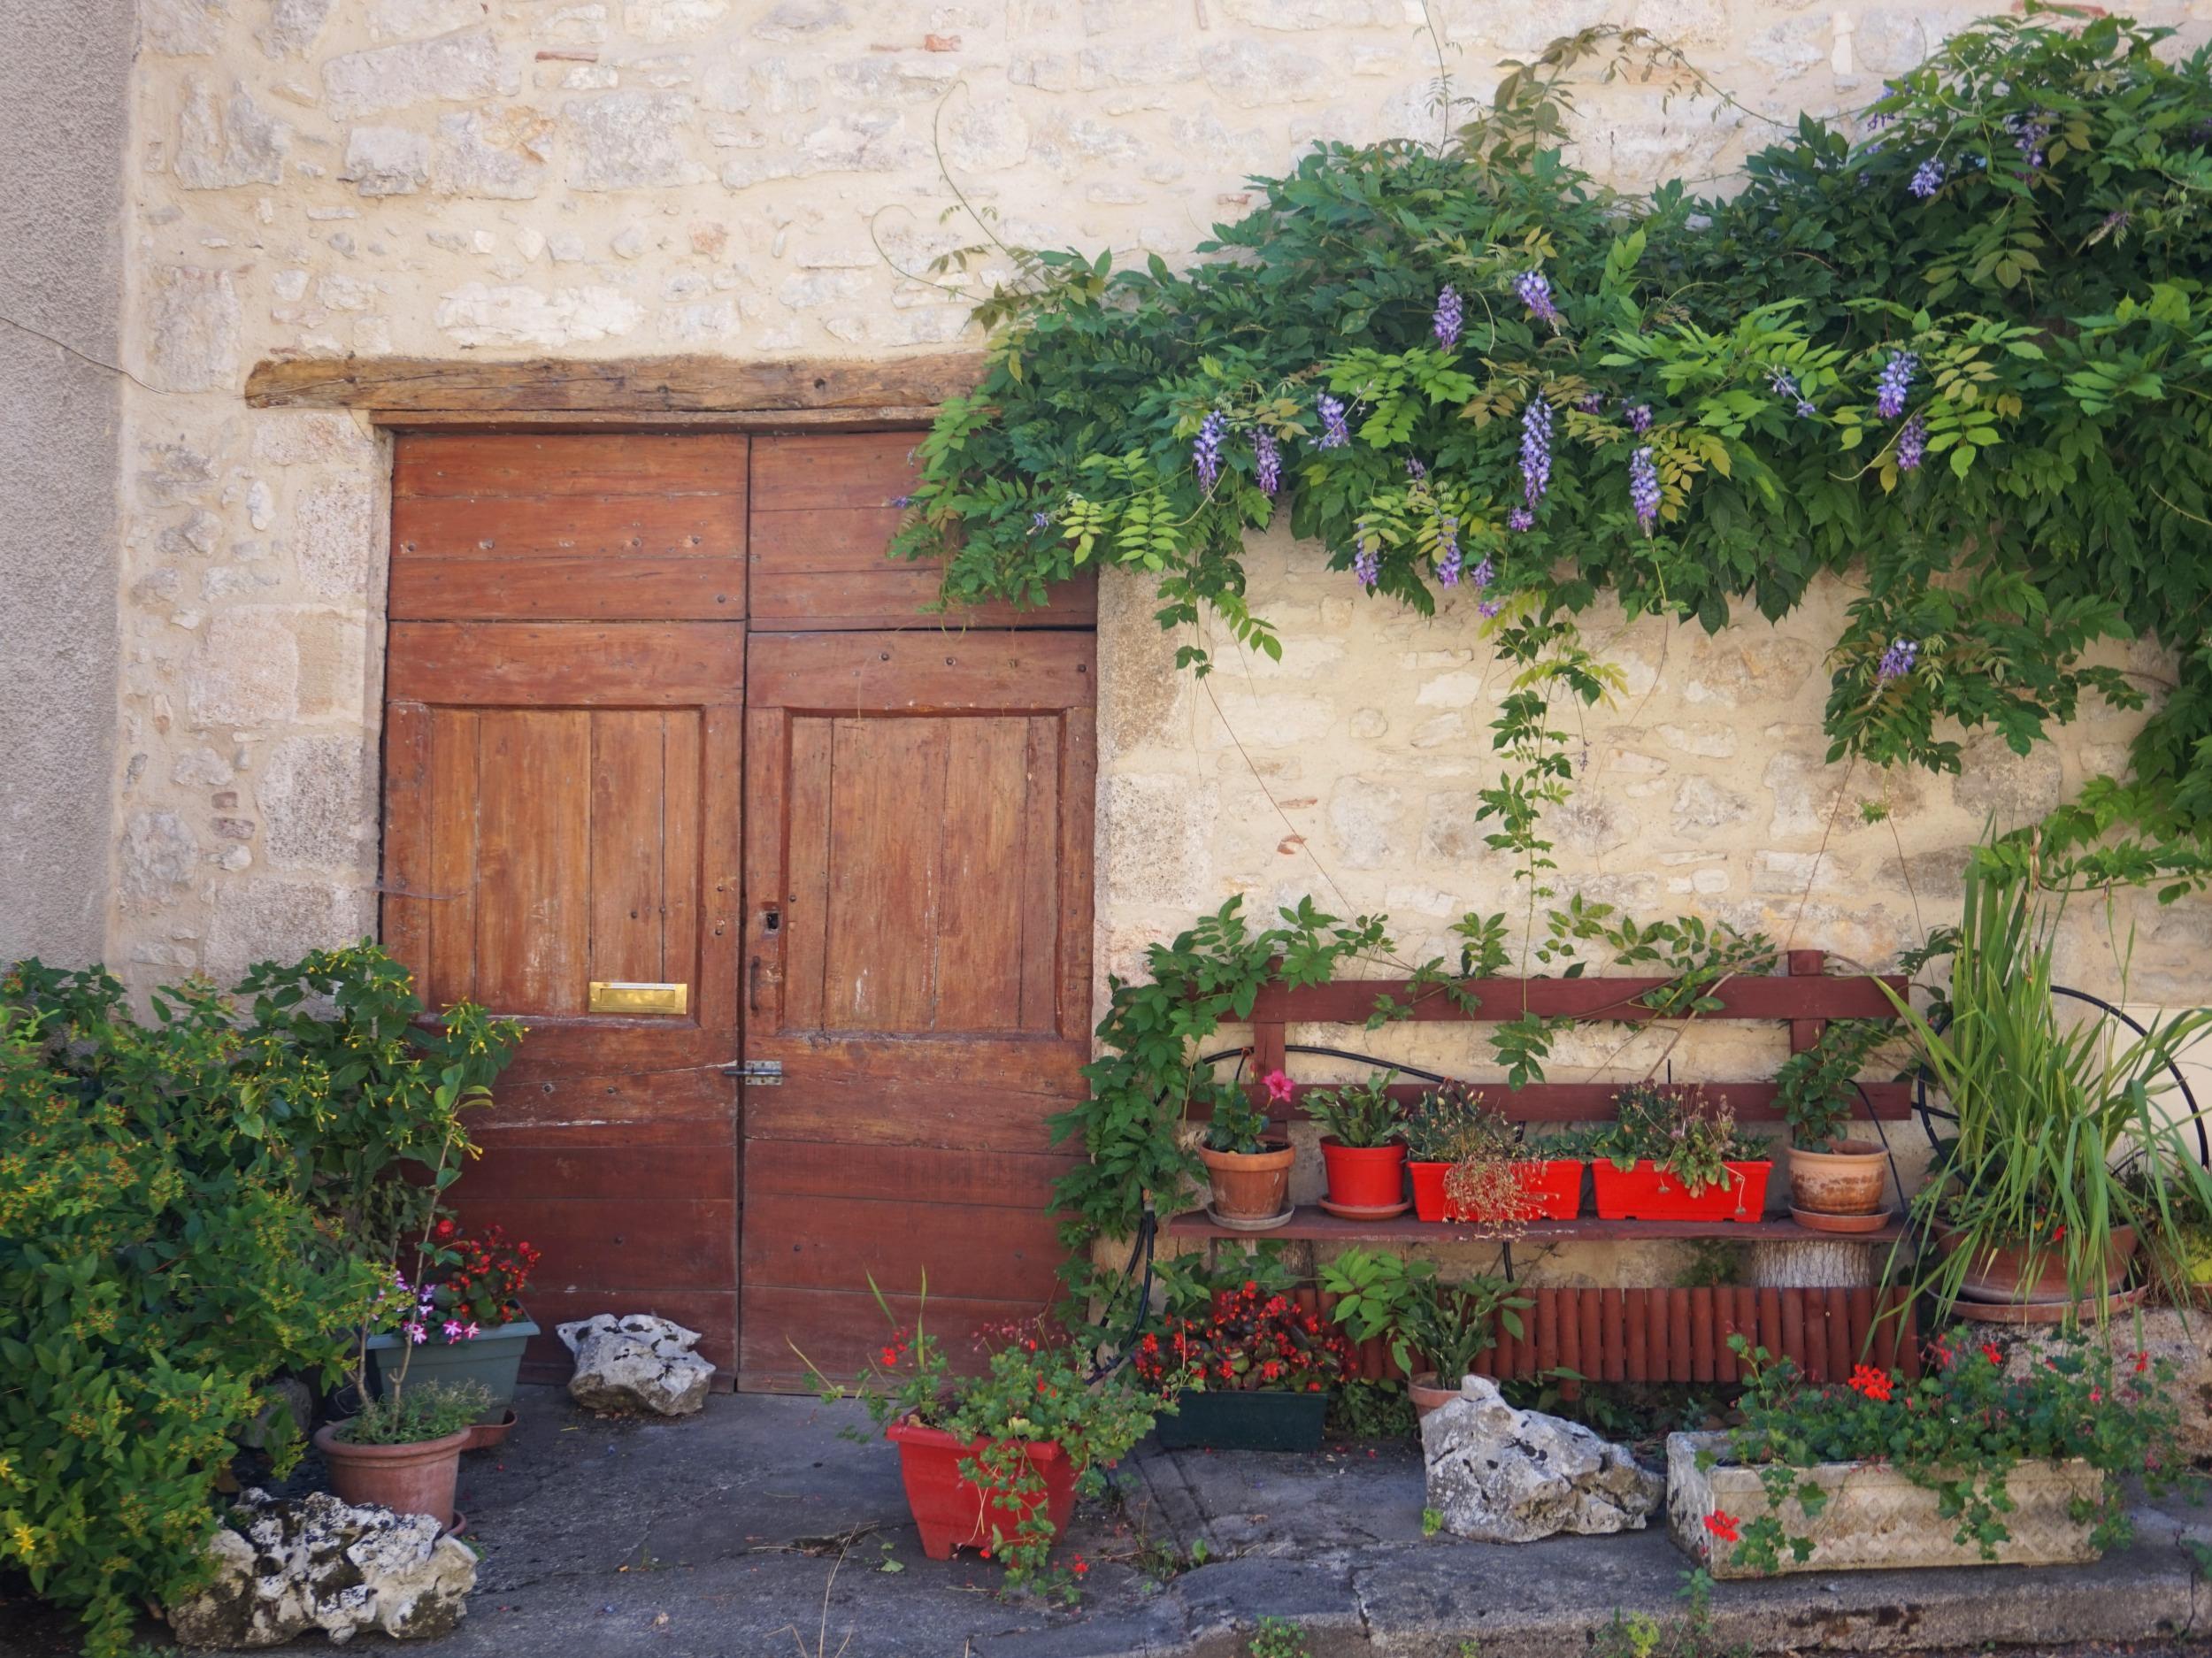 Saint-Cirq-Lapopie-7